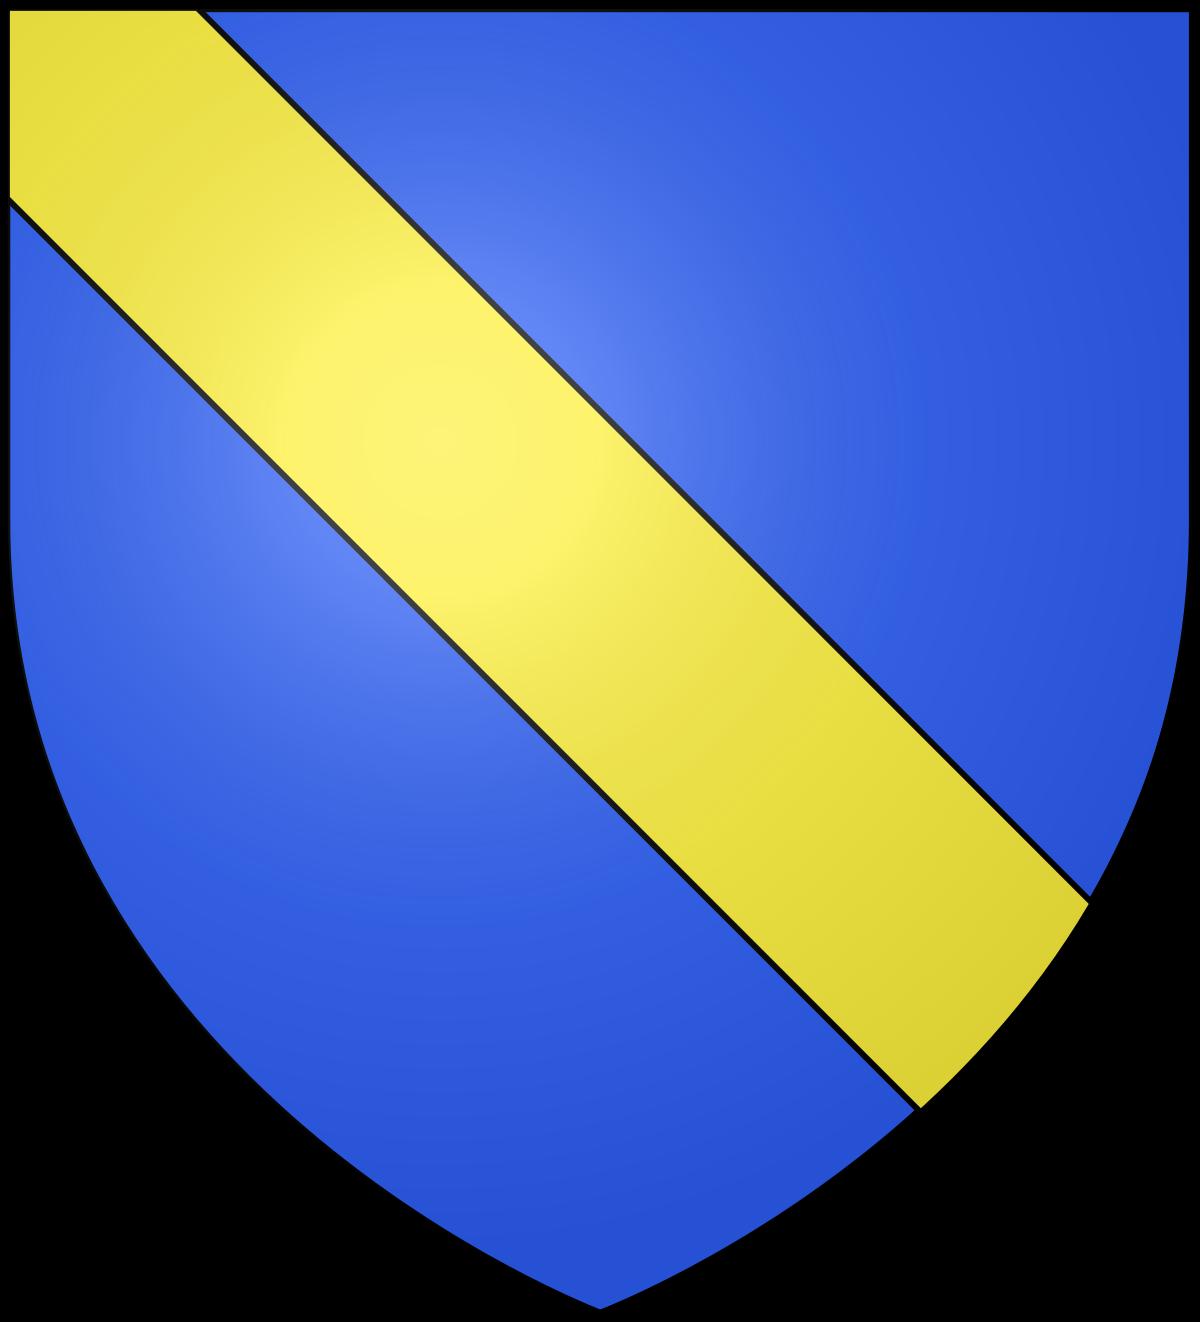 Wheat clipart heraldic. Scrope v grosvenor wikipedia